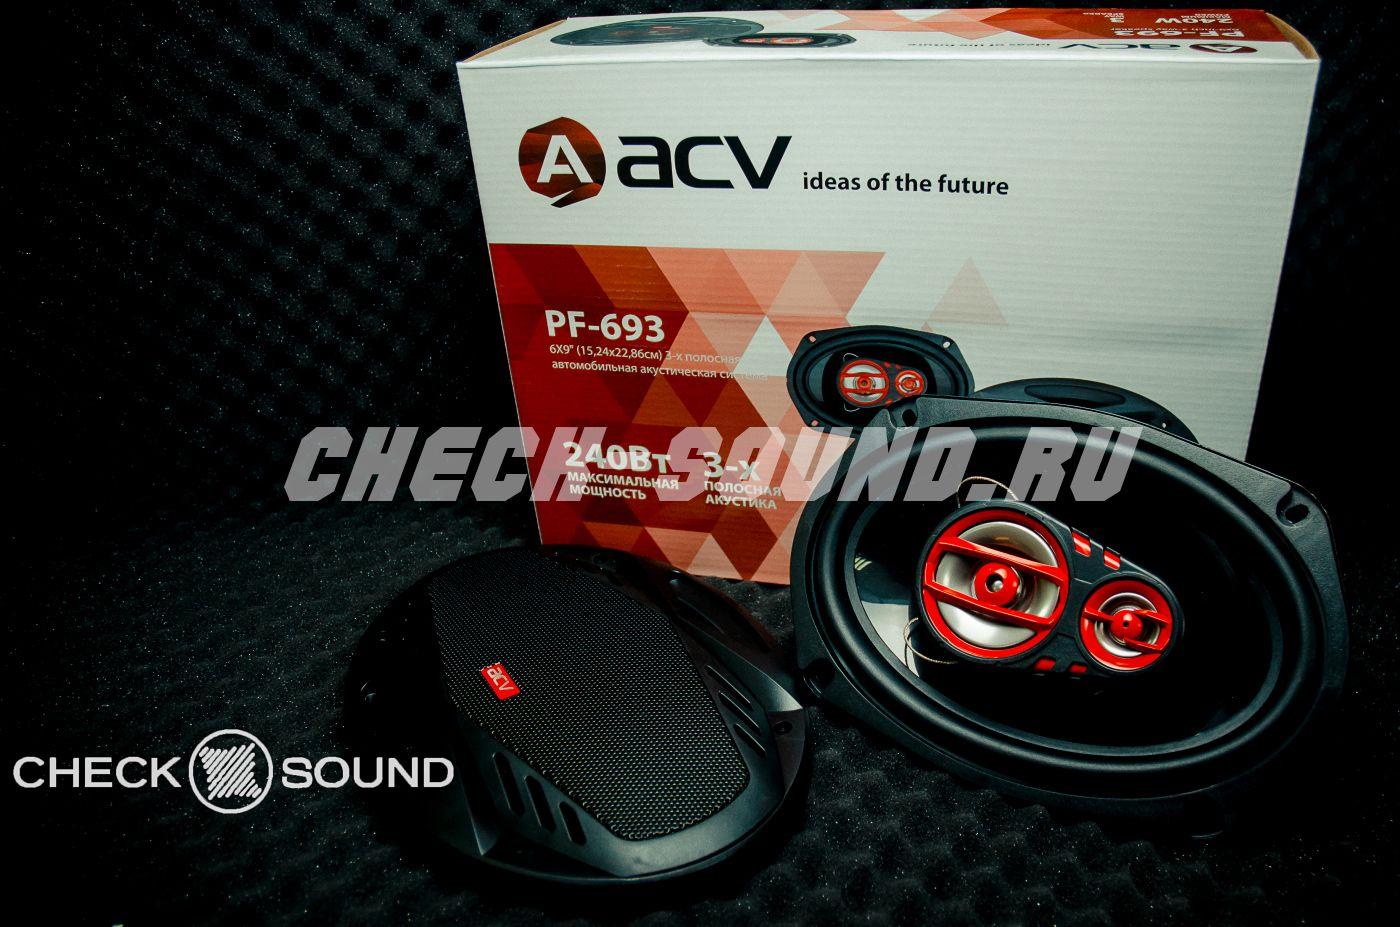 ACV PF-693